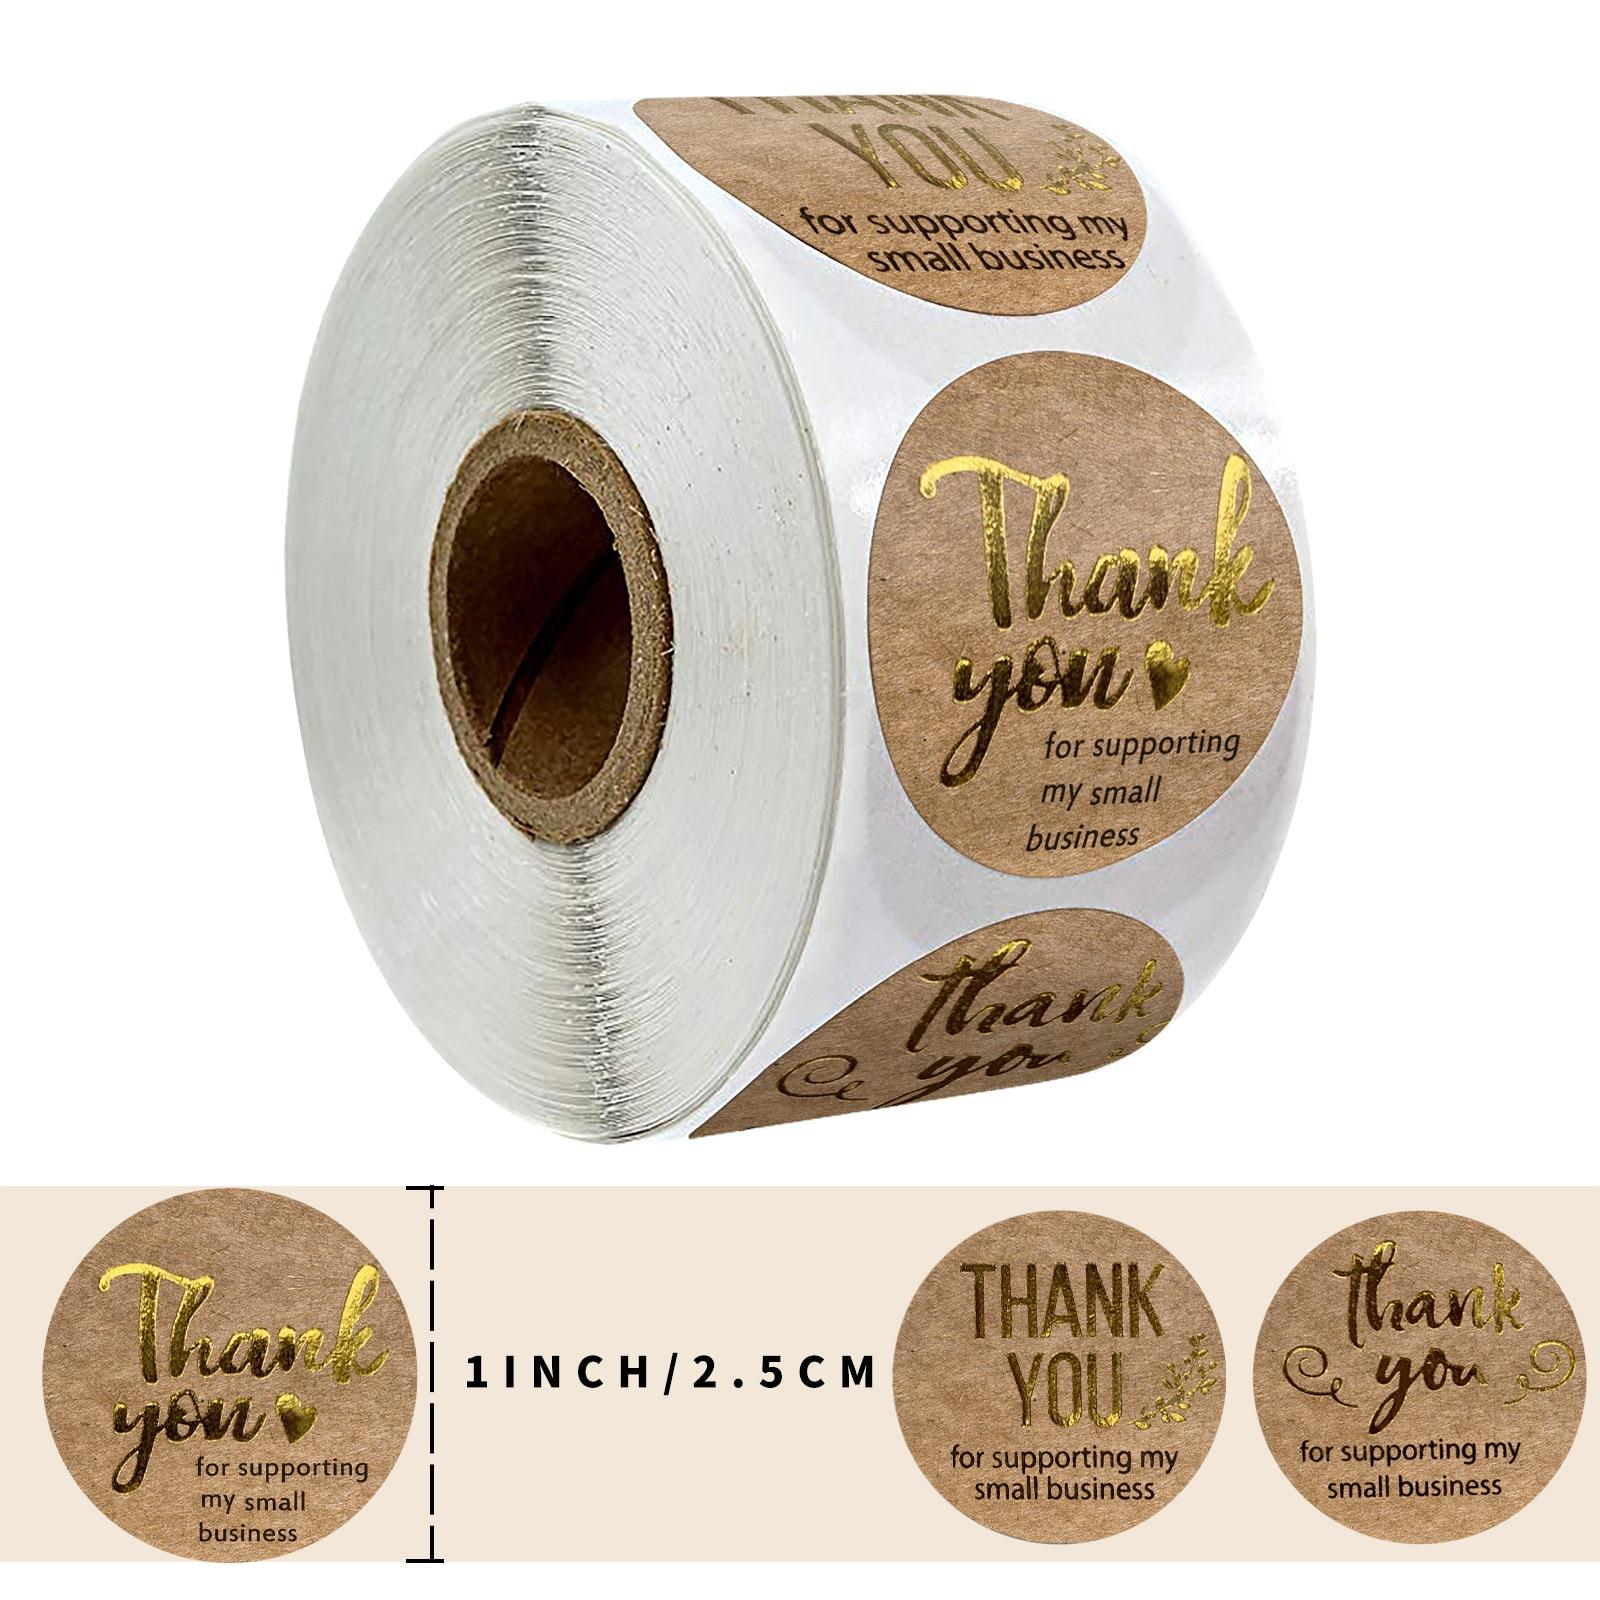 500-uds-rollo-dorado-estetico-gracias-pegatinas-para-diario-para-restaurante-boda-suministros-busines-embalaje-adhesivo-de-papeleria